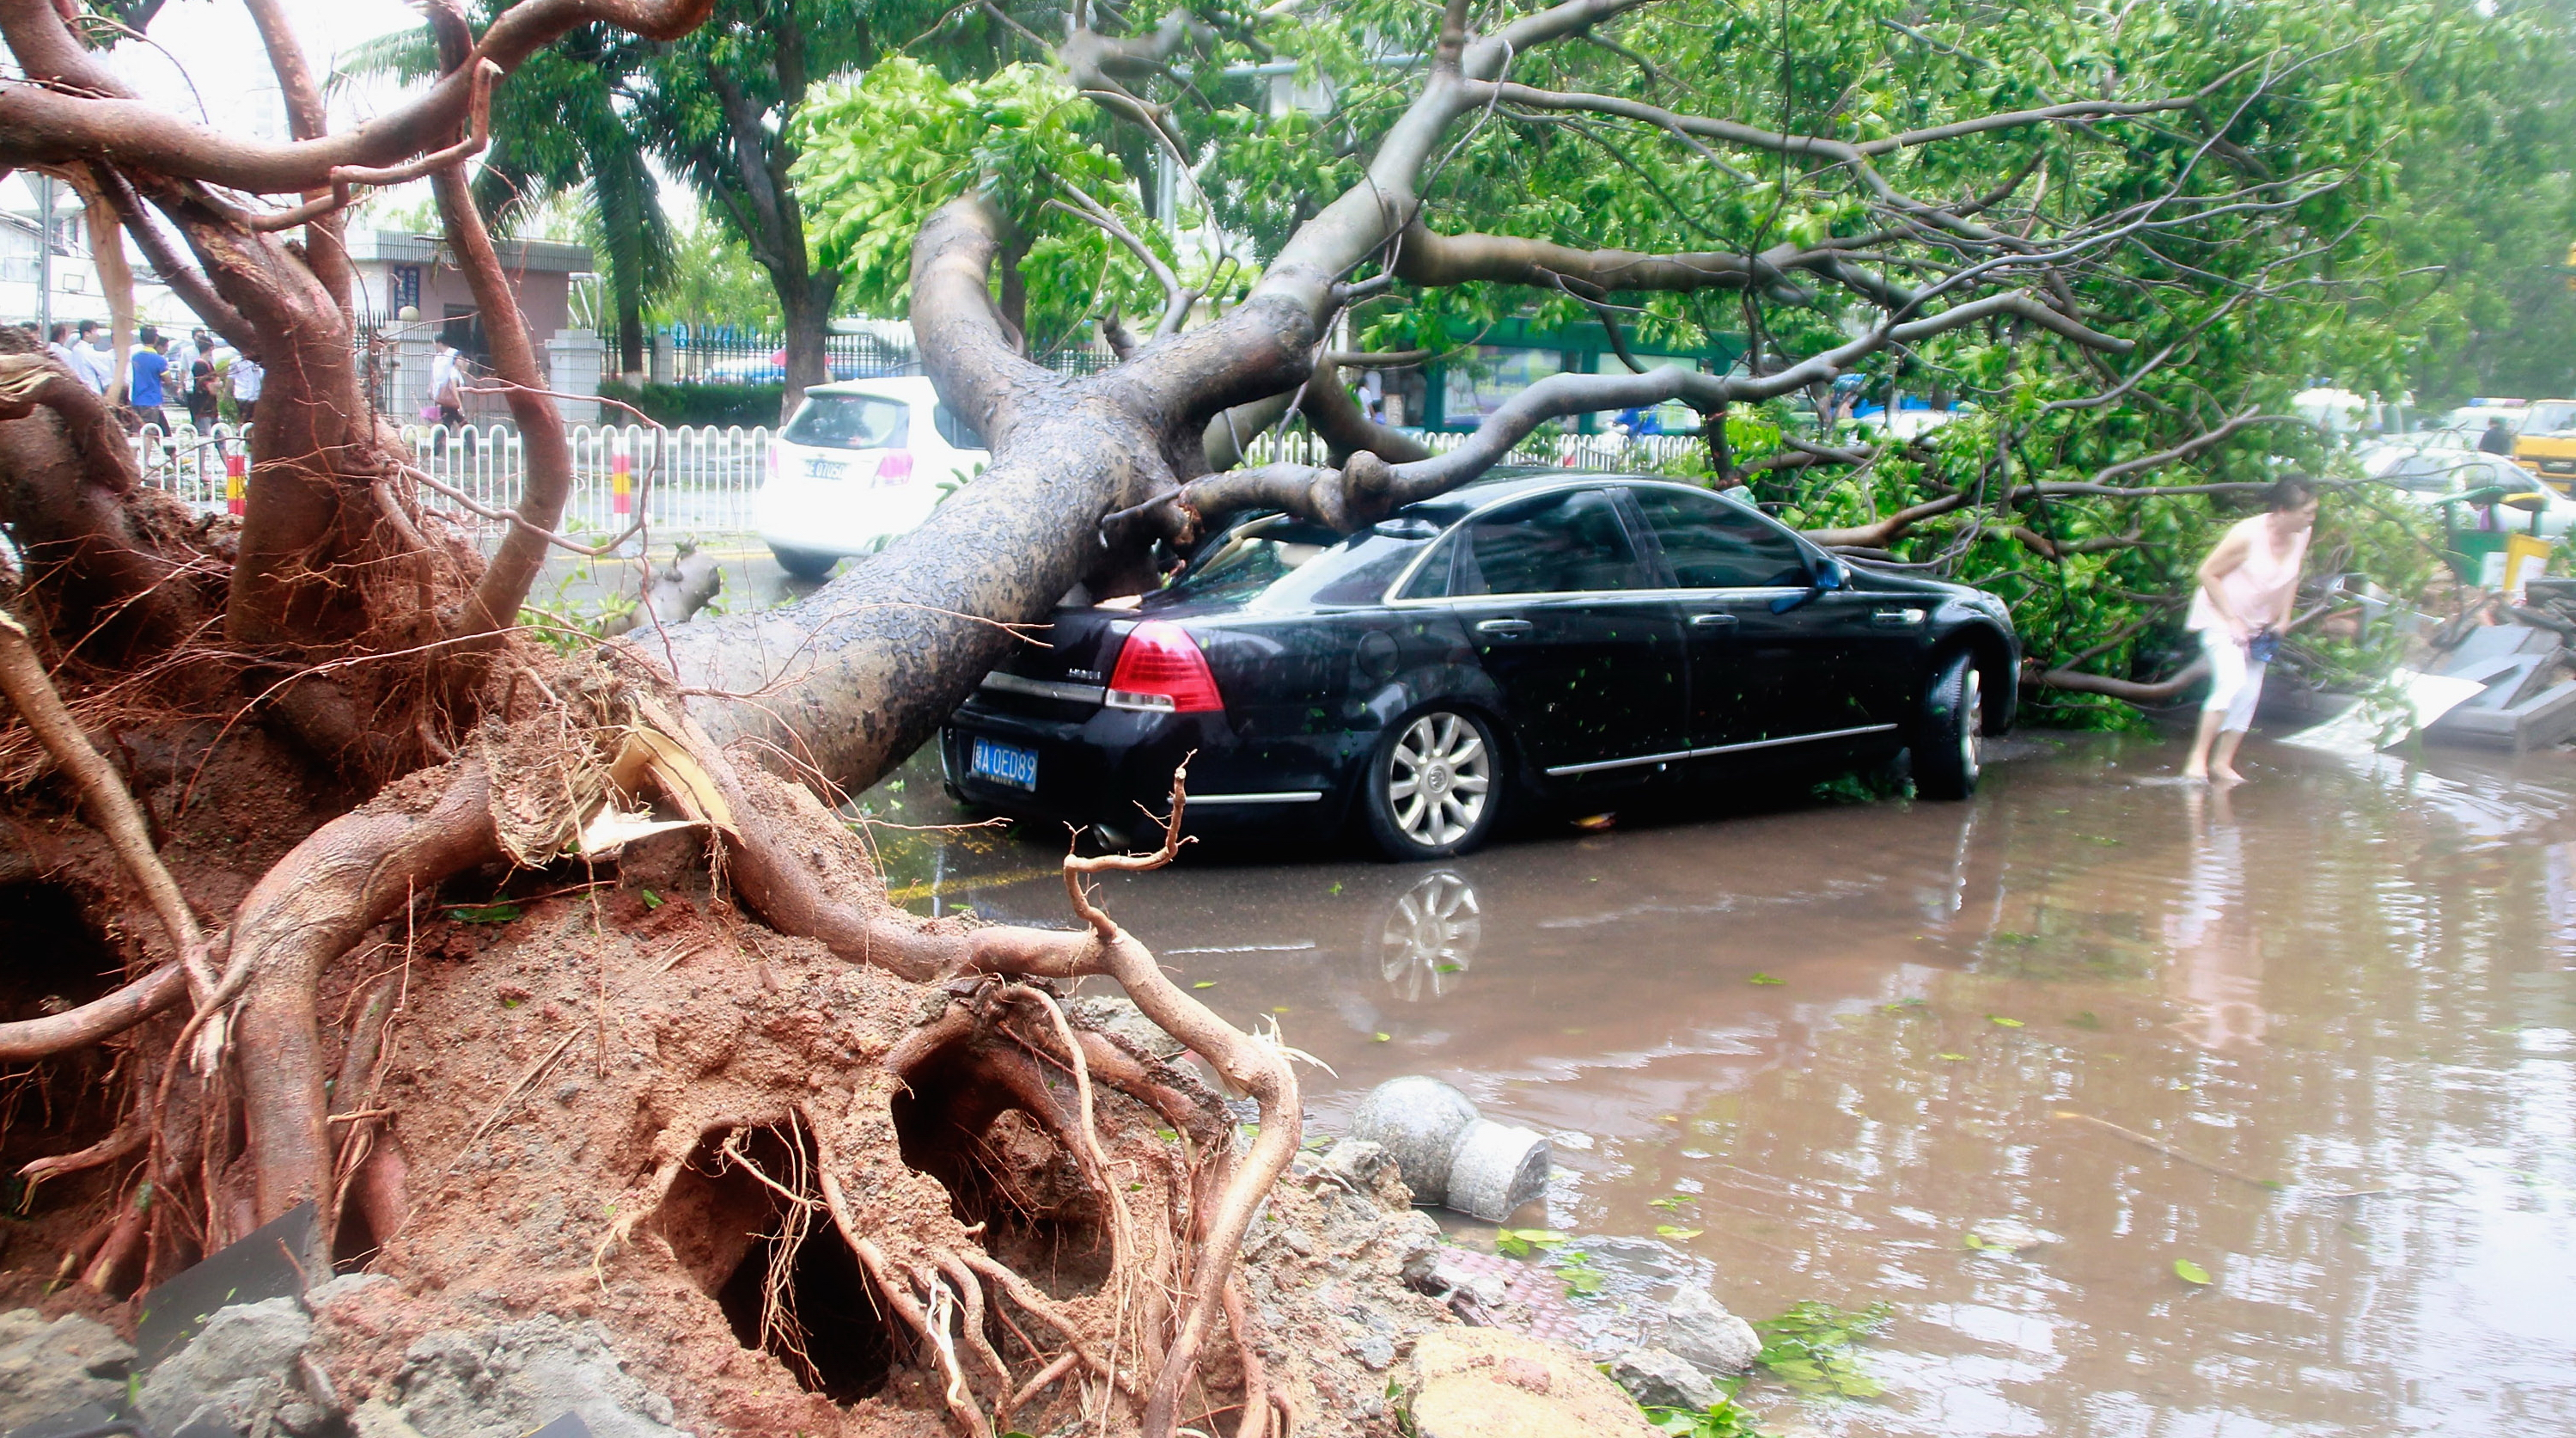 127590682 - Тайфун Винсент обрушился на Гонконг и Гуандун